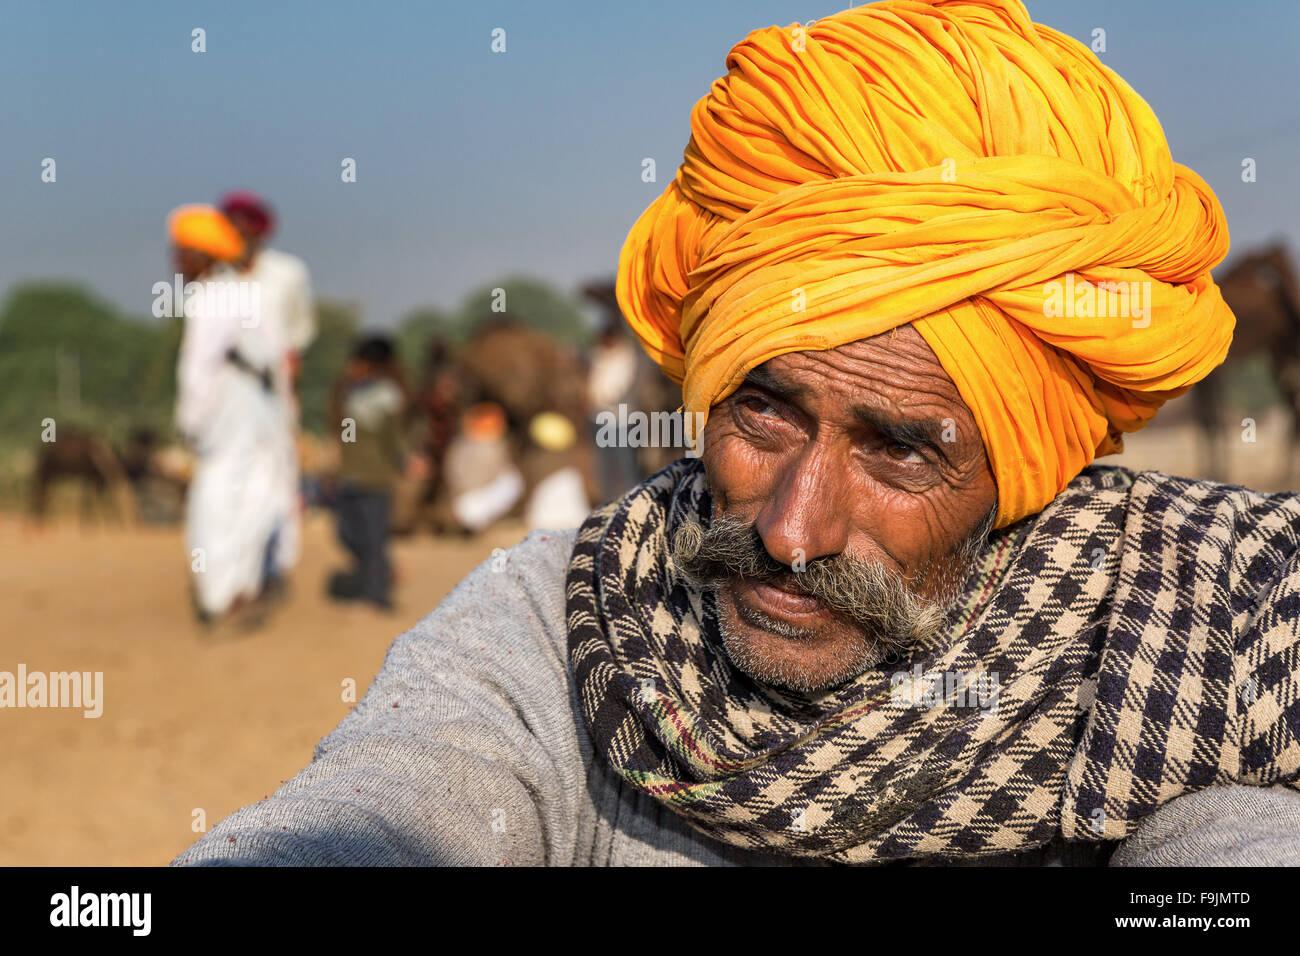 Portrait of a senior Rajasthani with a yellow turban, Pushkar Camel Fair, Rajasthan, India - Stock Image